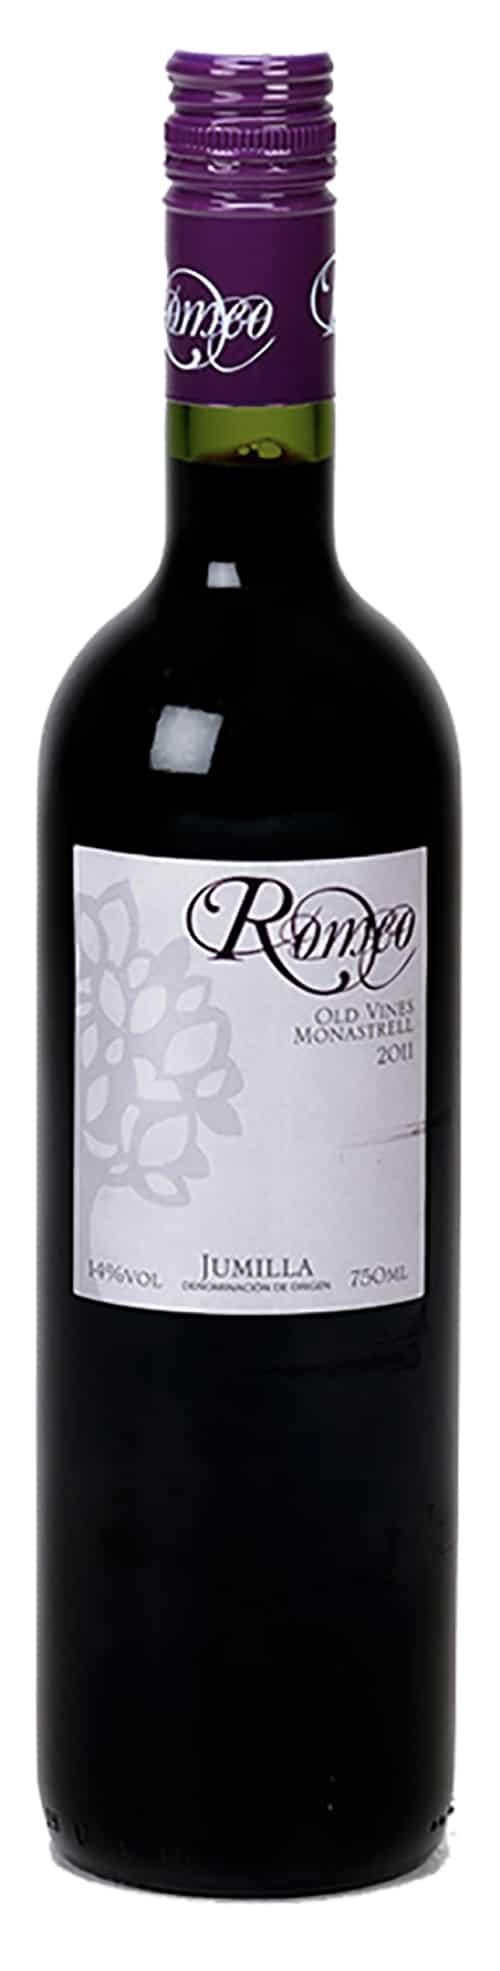 Romeo Old Vines Monastrell